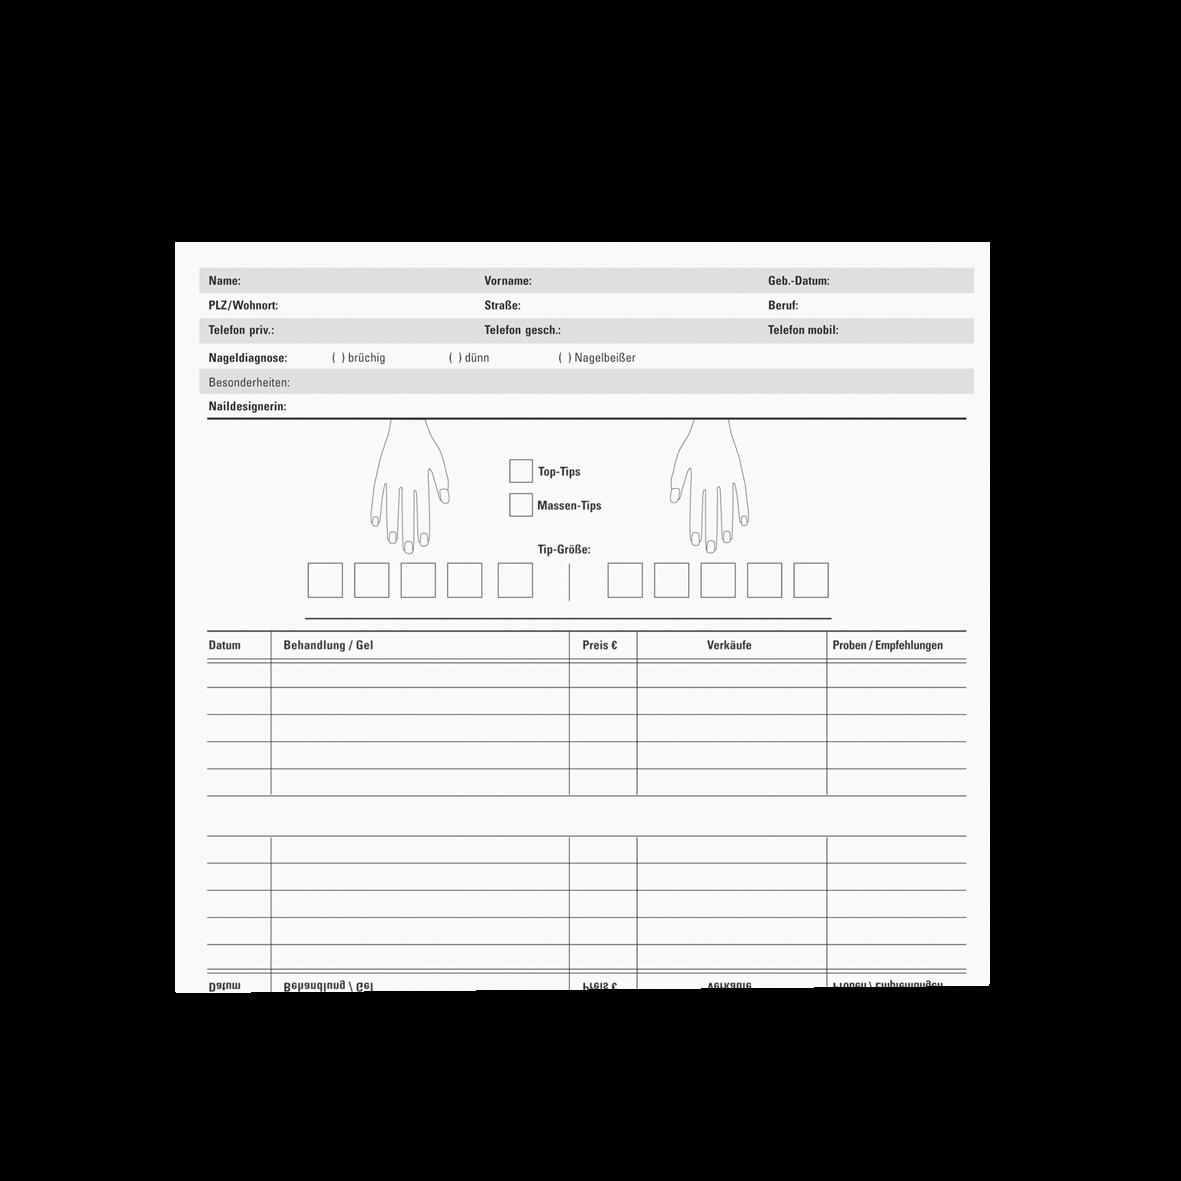 Nail-Karteikarten 100ST/PCK 1 Pack (100 Stk.)